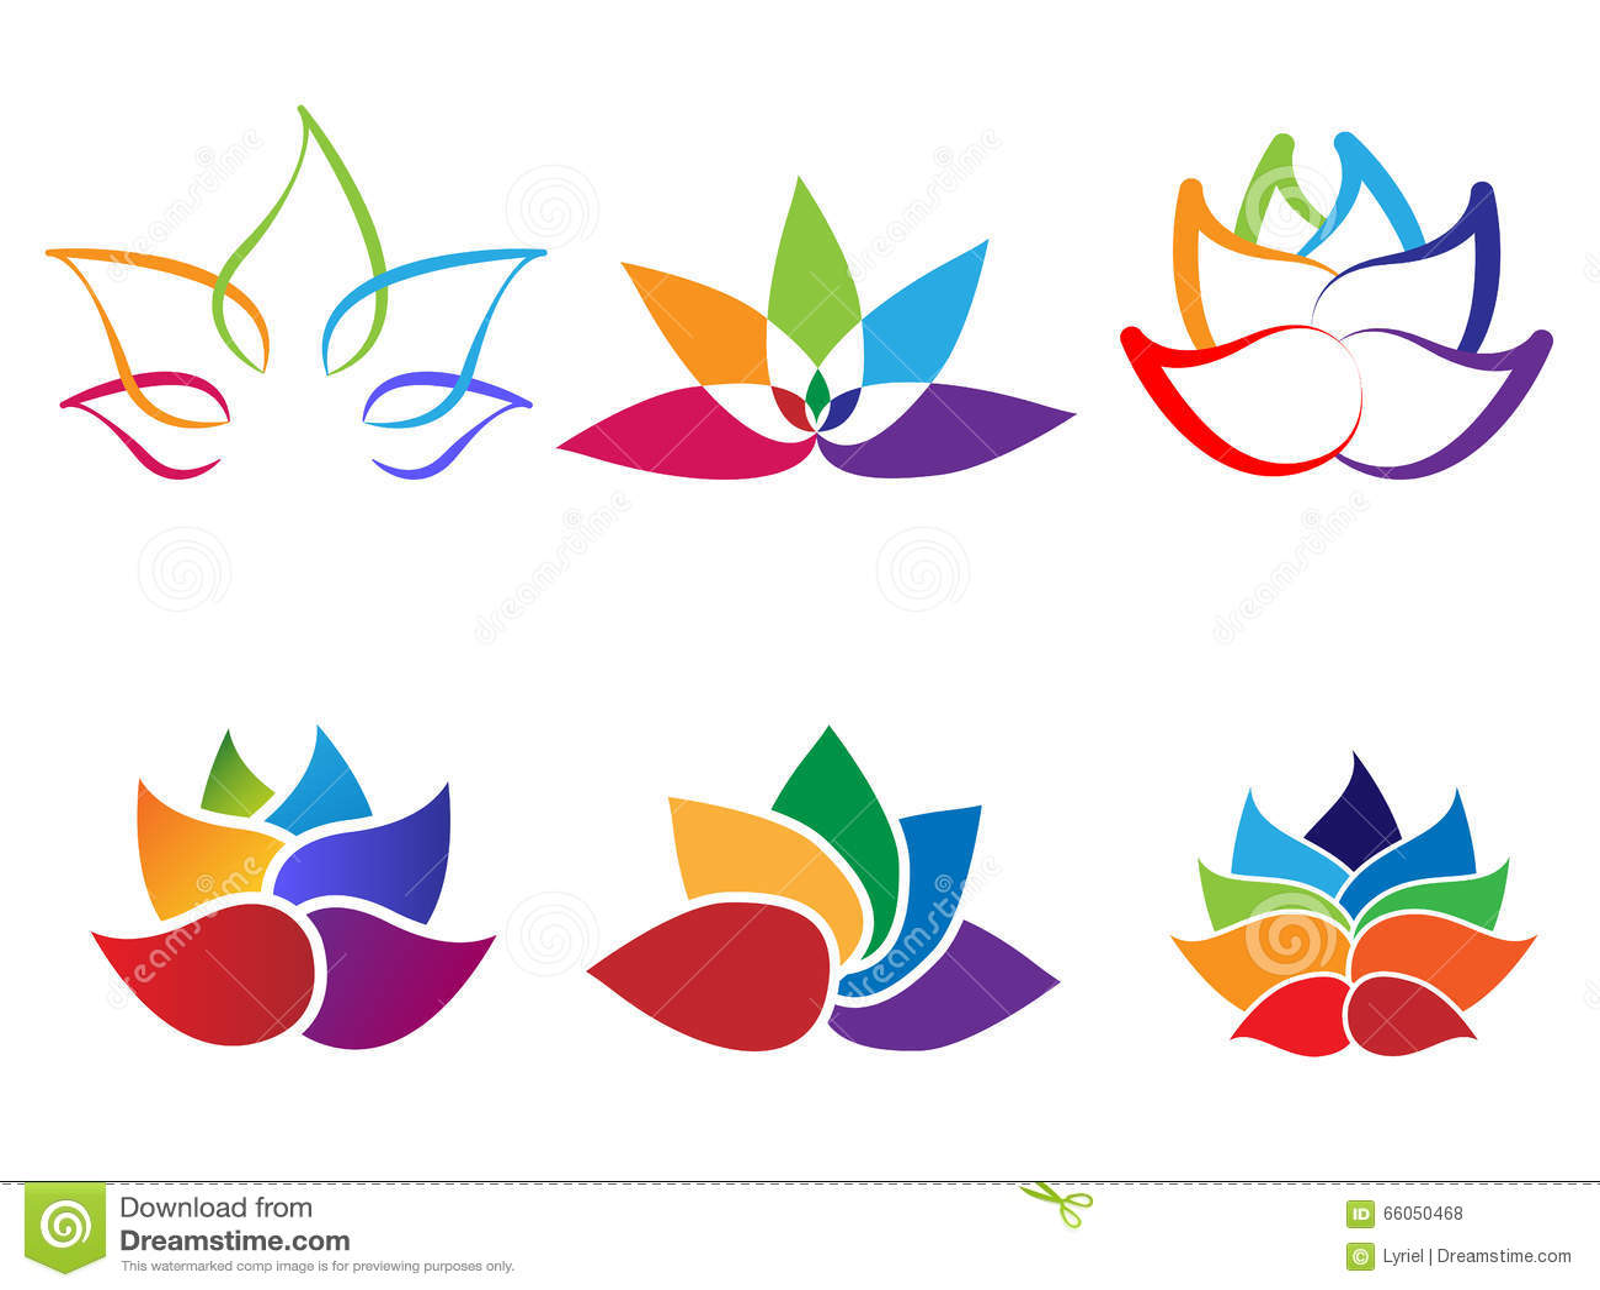 Rainbow lotus flower abstract logo stock vector illustration of rainbow lotus flower abstract logo izmirmasajfo